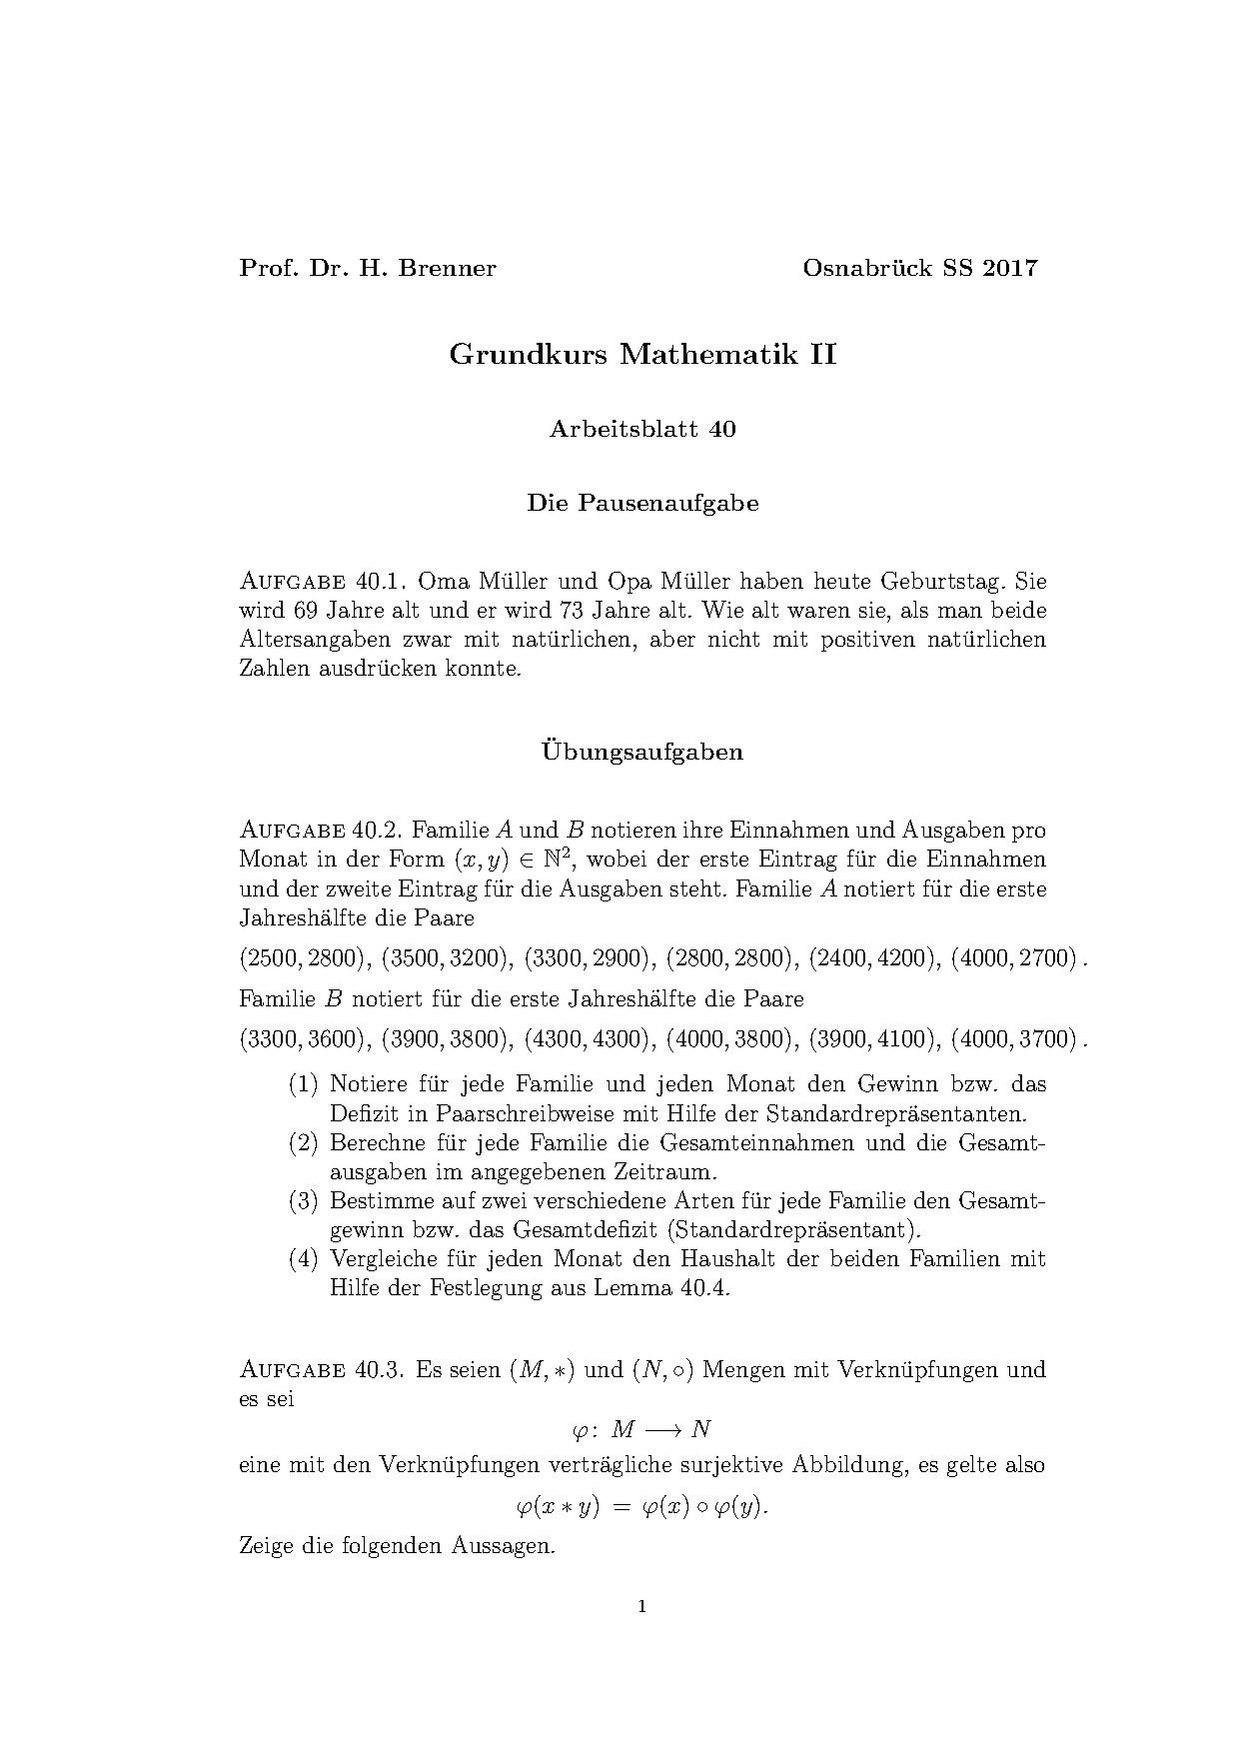 File:Grundkurs Mathematik (Osnabrück 2016-2017)Teil IIArbeitsblatt40 ...